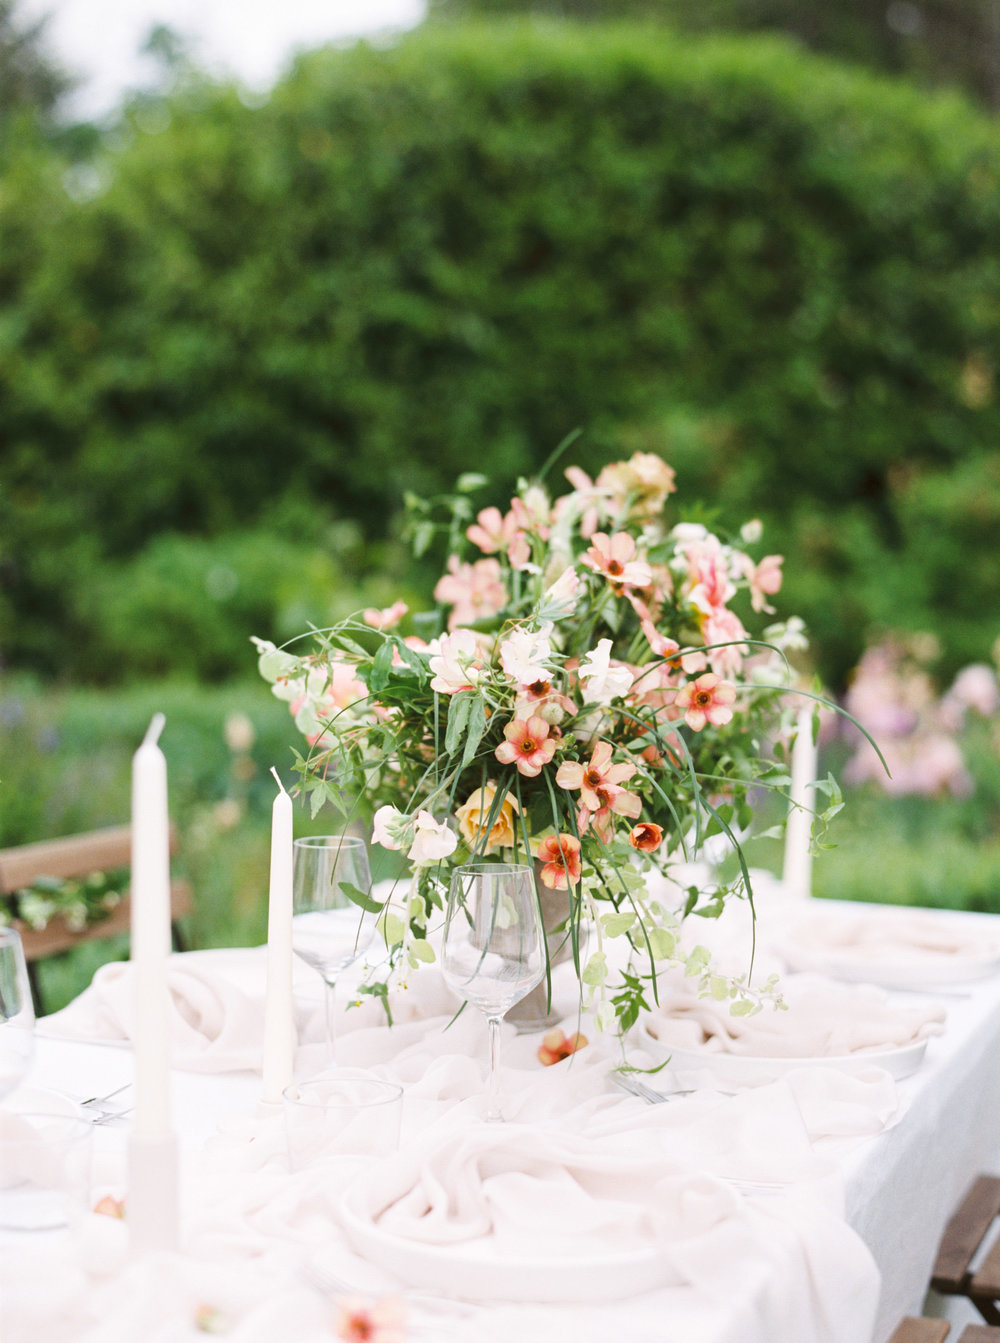 Timeless Southern Highland Wedding Elopement in Bowral NSW Fine Art Film Photographer Sheri McMahon-47.jpg